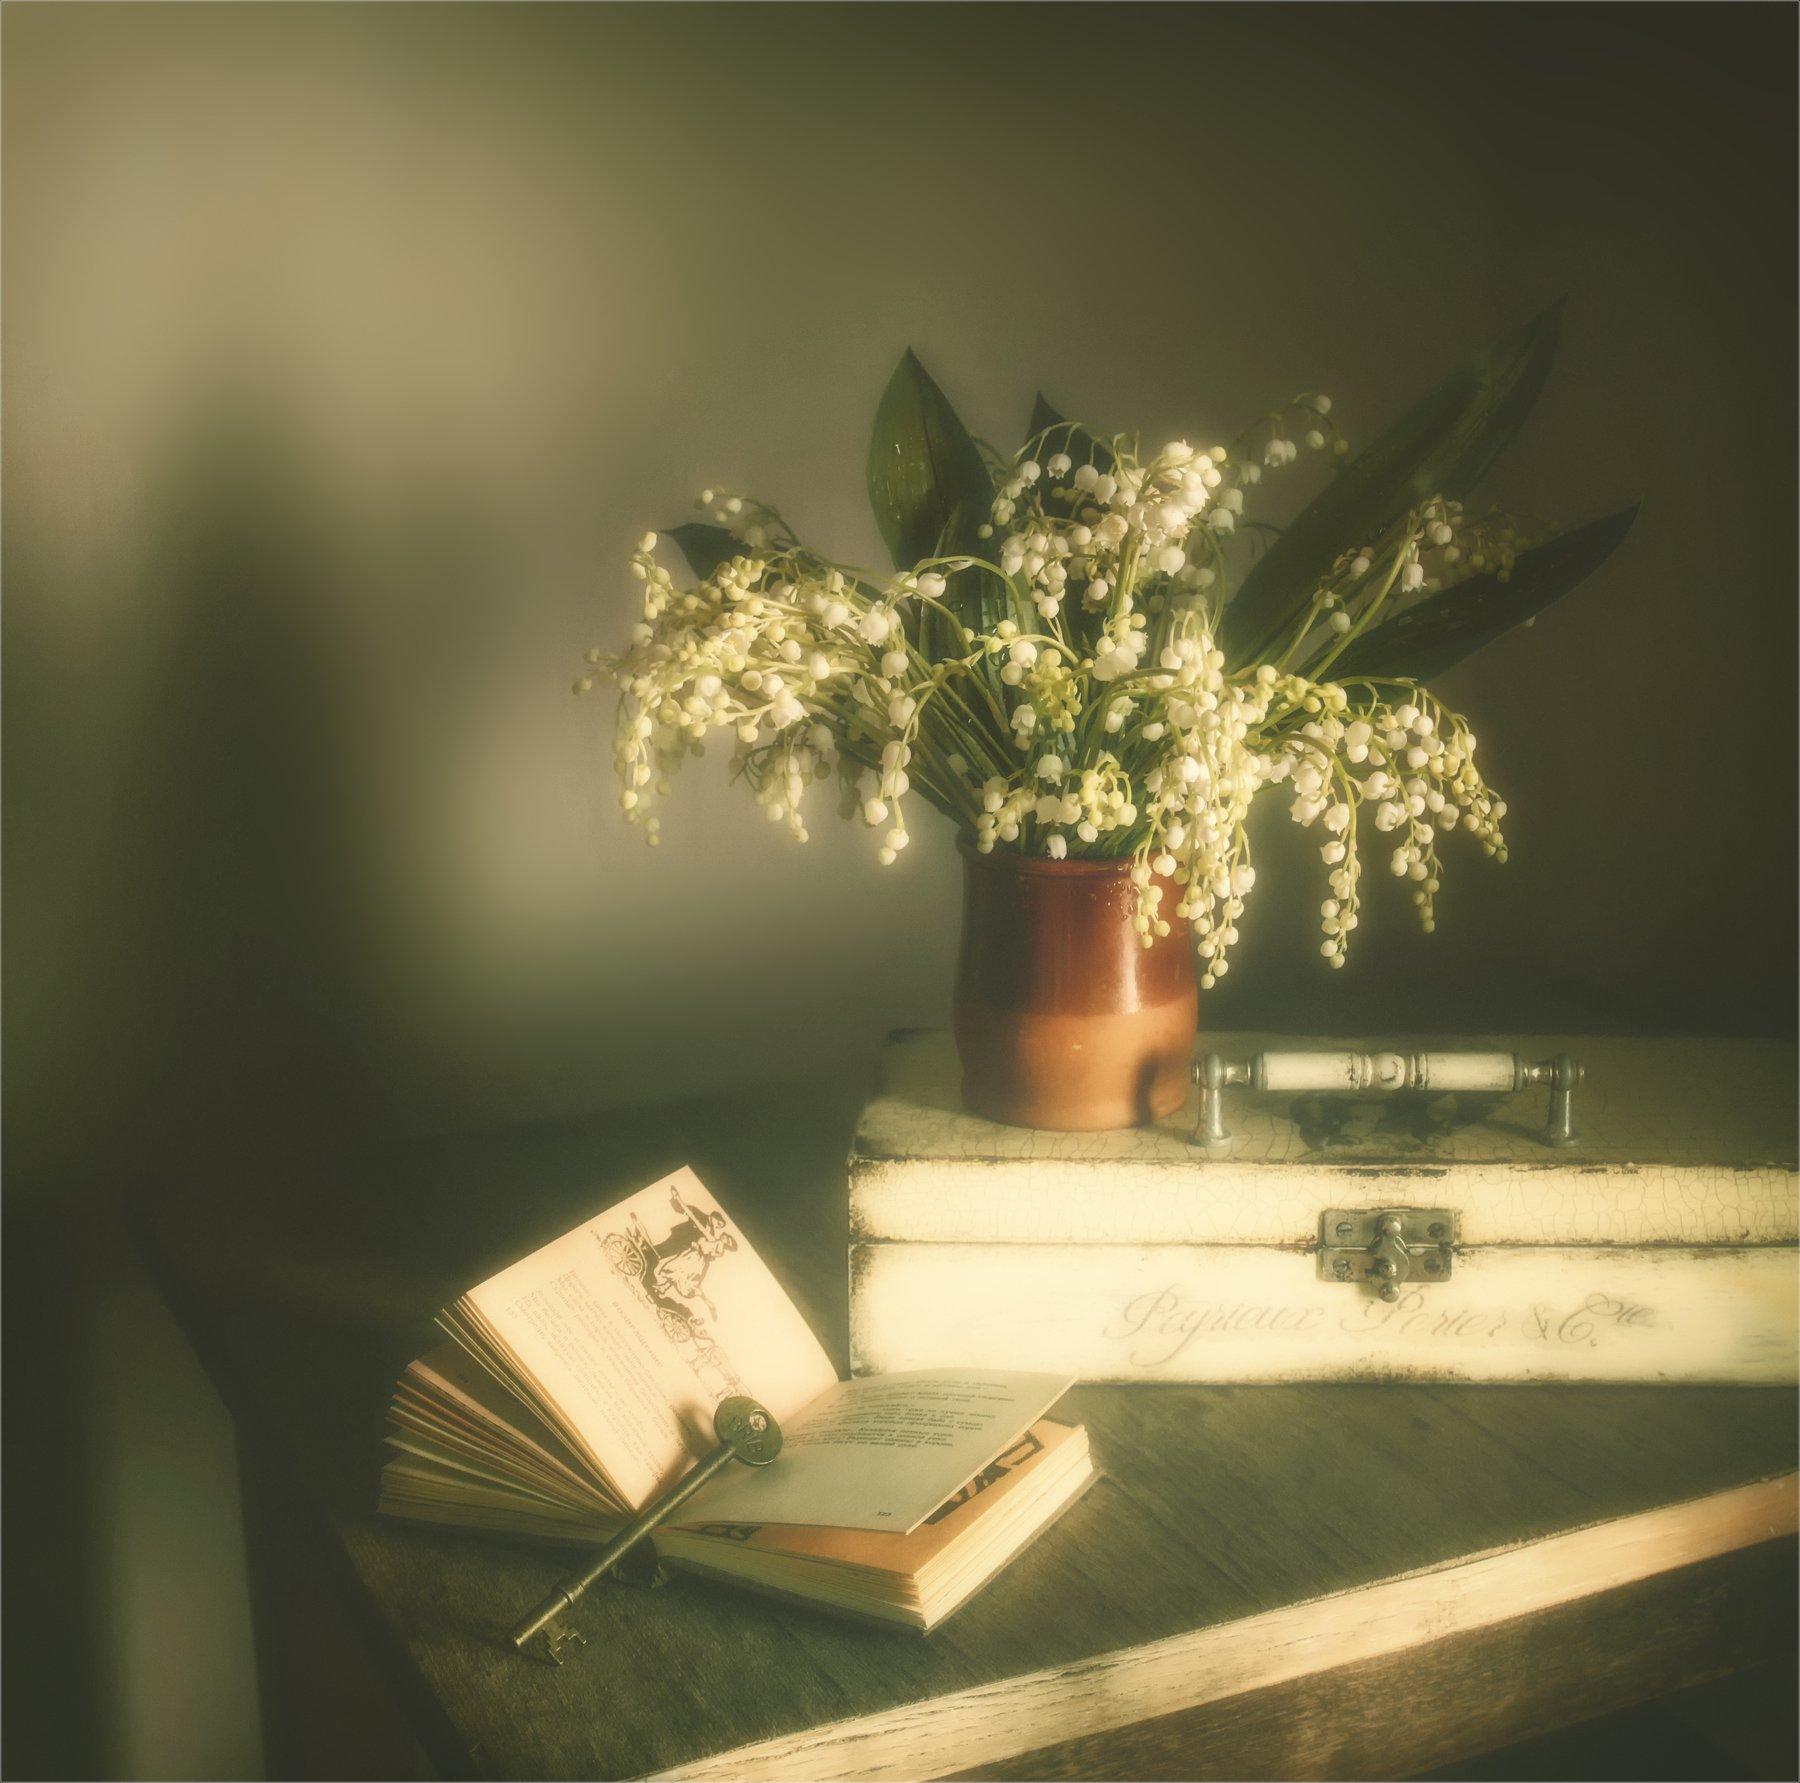 still life, натюрморт,    растение, природа,  винтаж, , цветы, ландыши, букет, книга, ключ, шкатулка, весна, аромат, романтика, нежность,, Михаил MSH